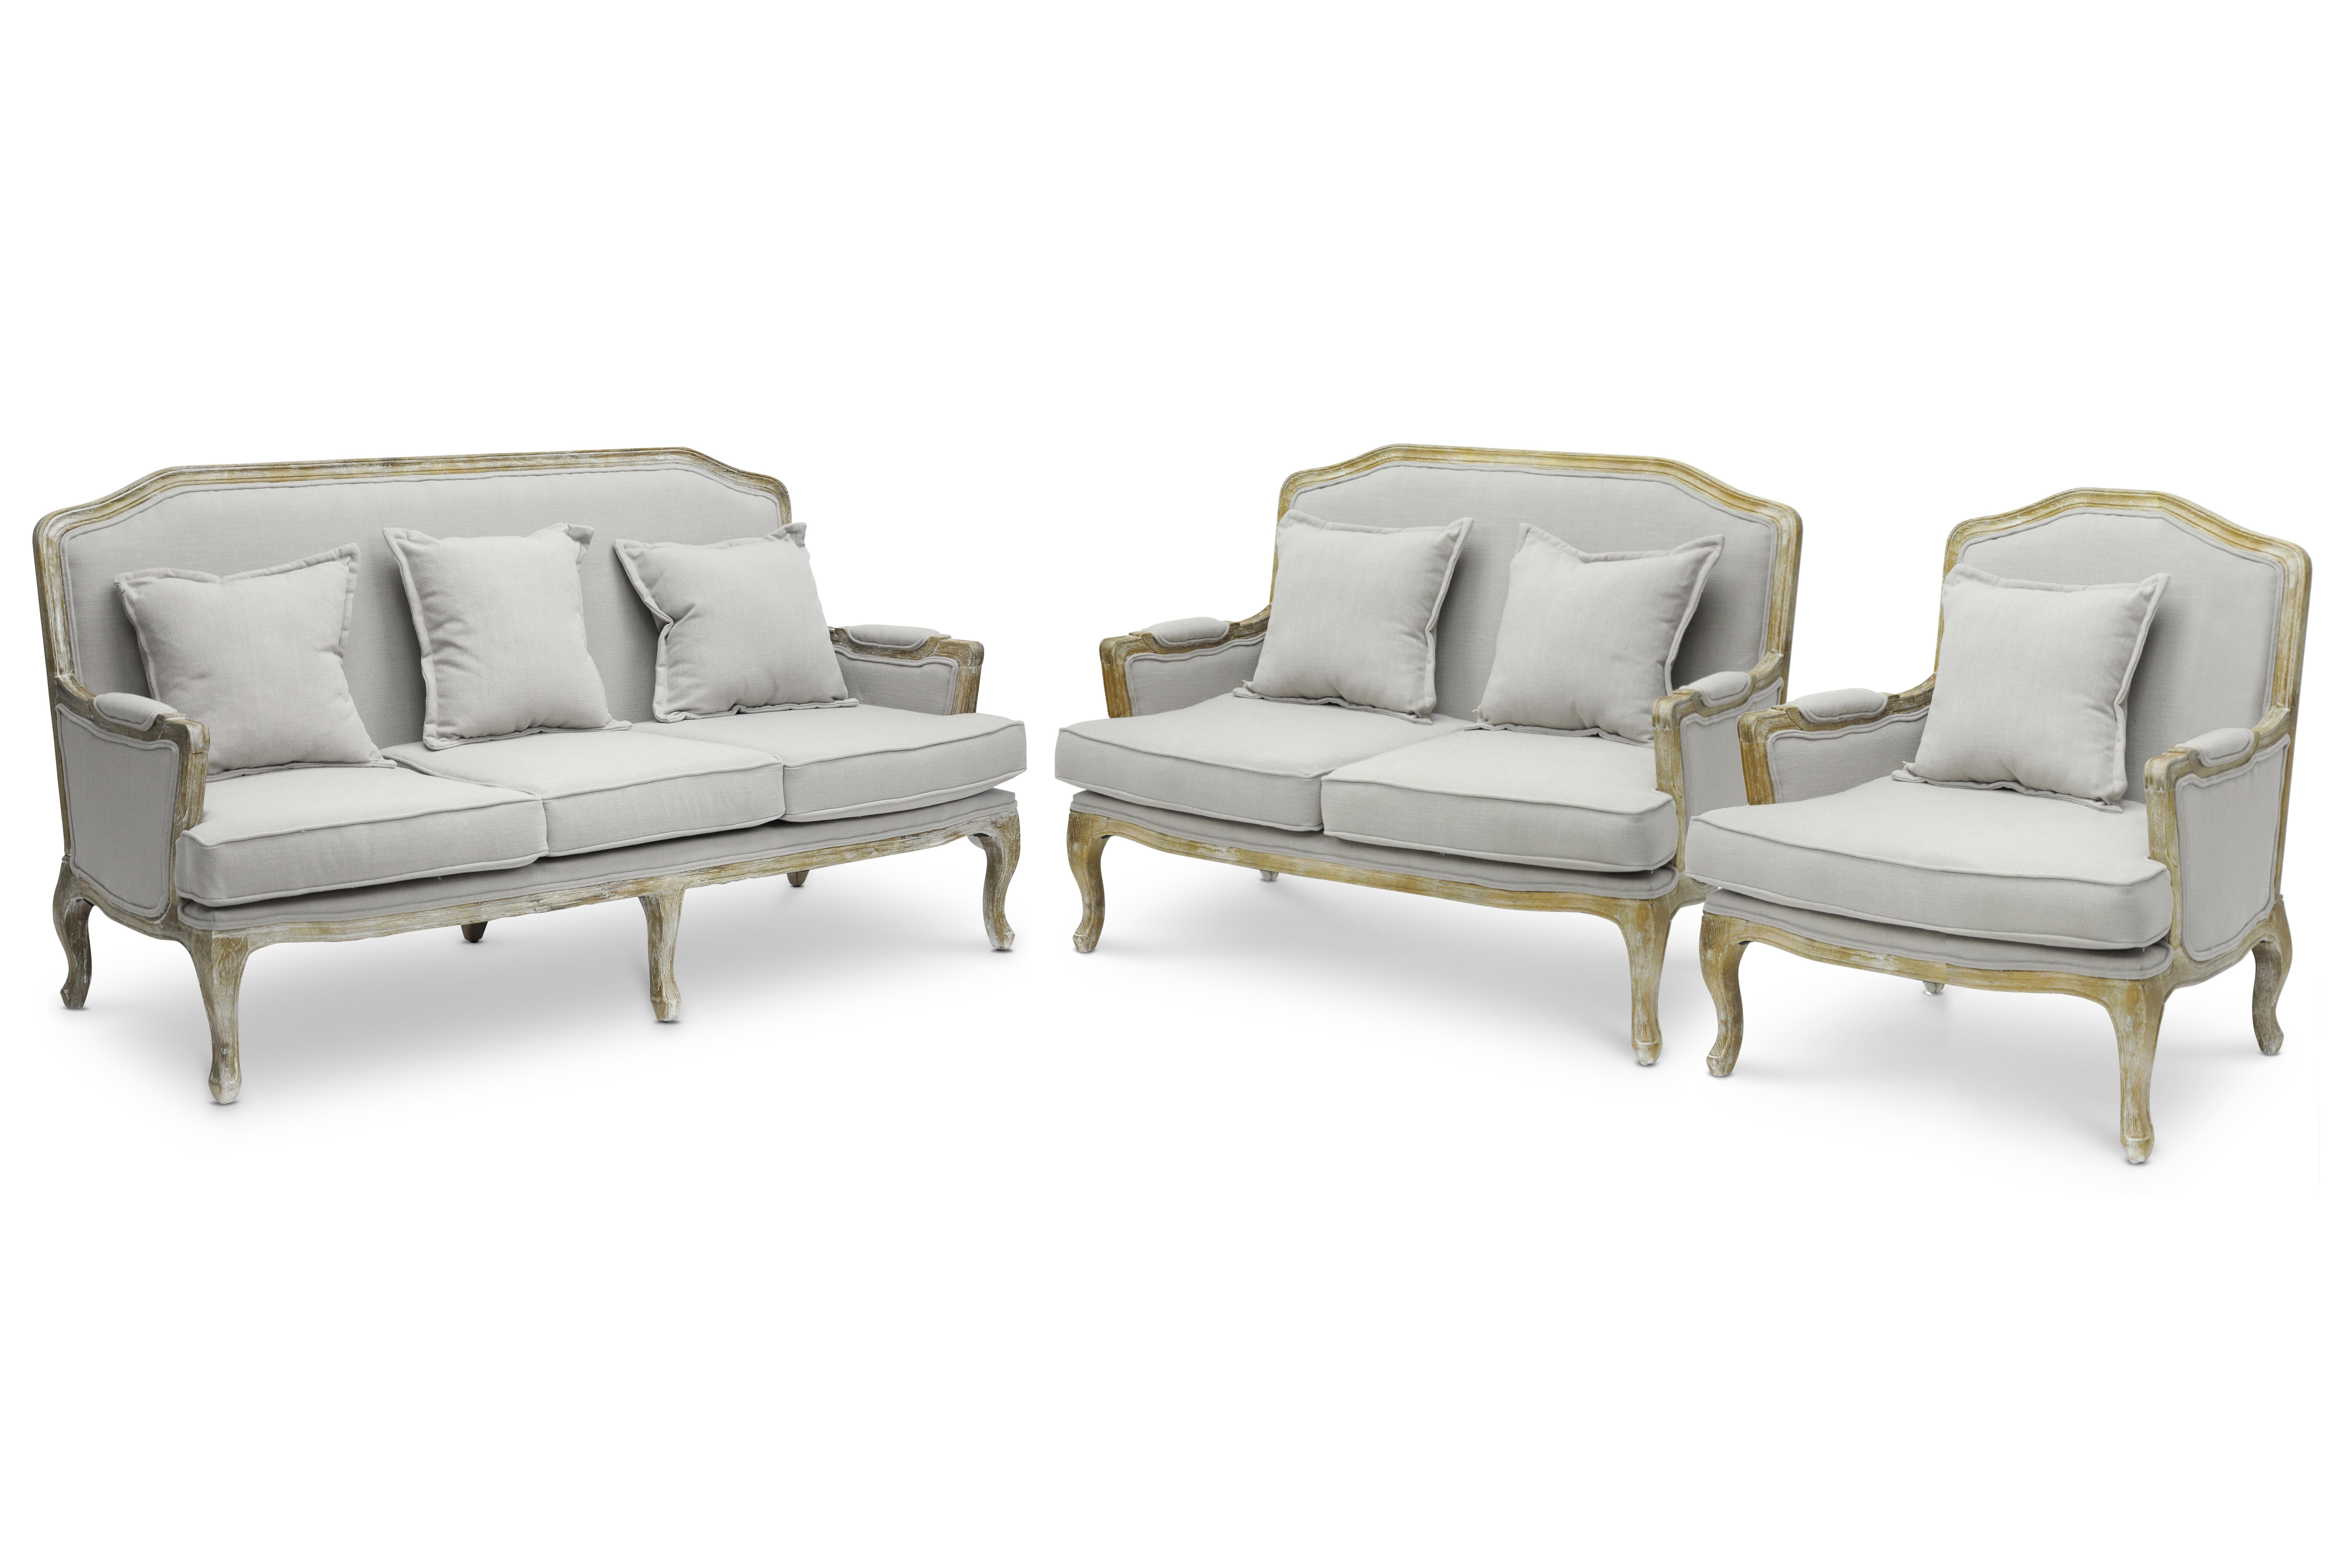 Baxton Studio Constanza Classic Antiqued French Sofa Set   IETA2256 Beige 3PC  Set ...